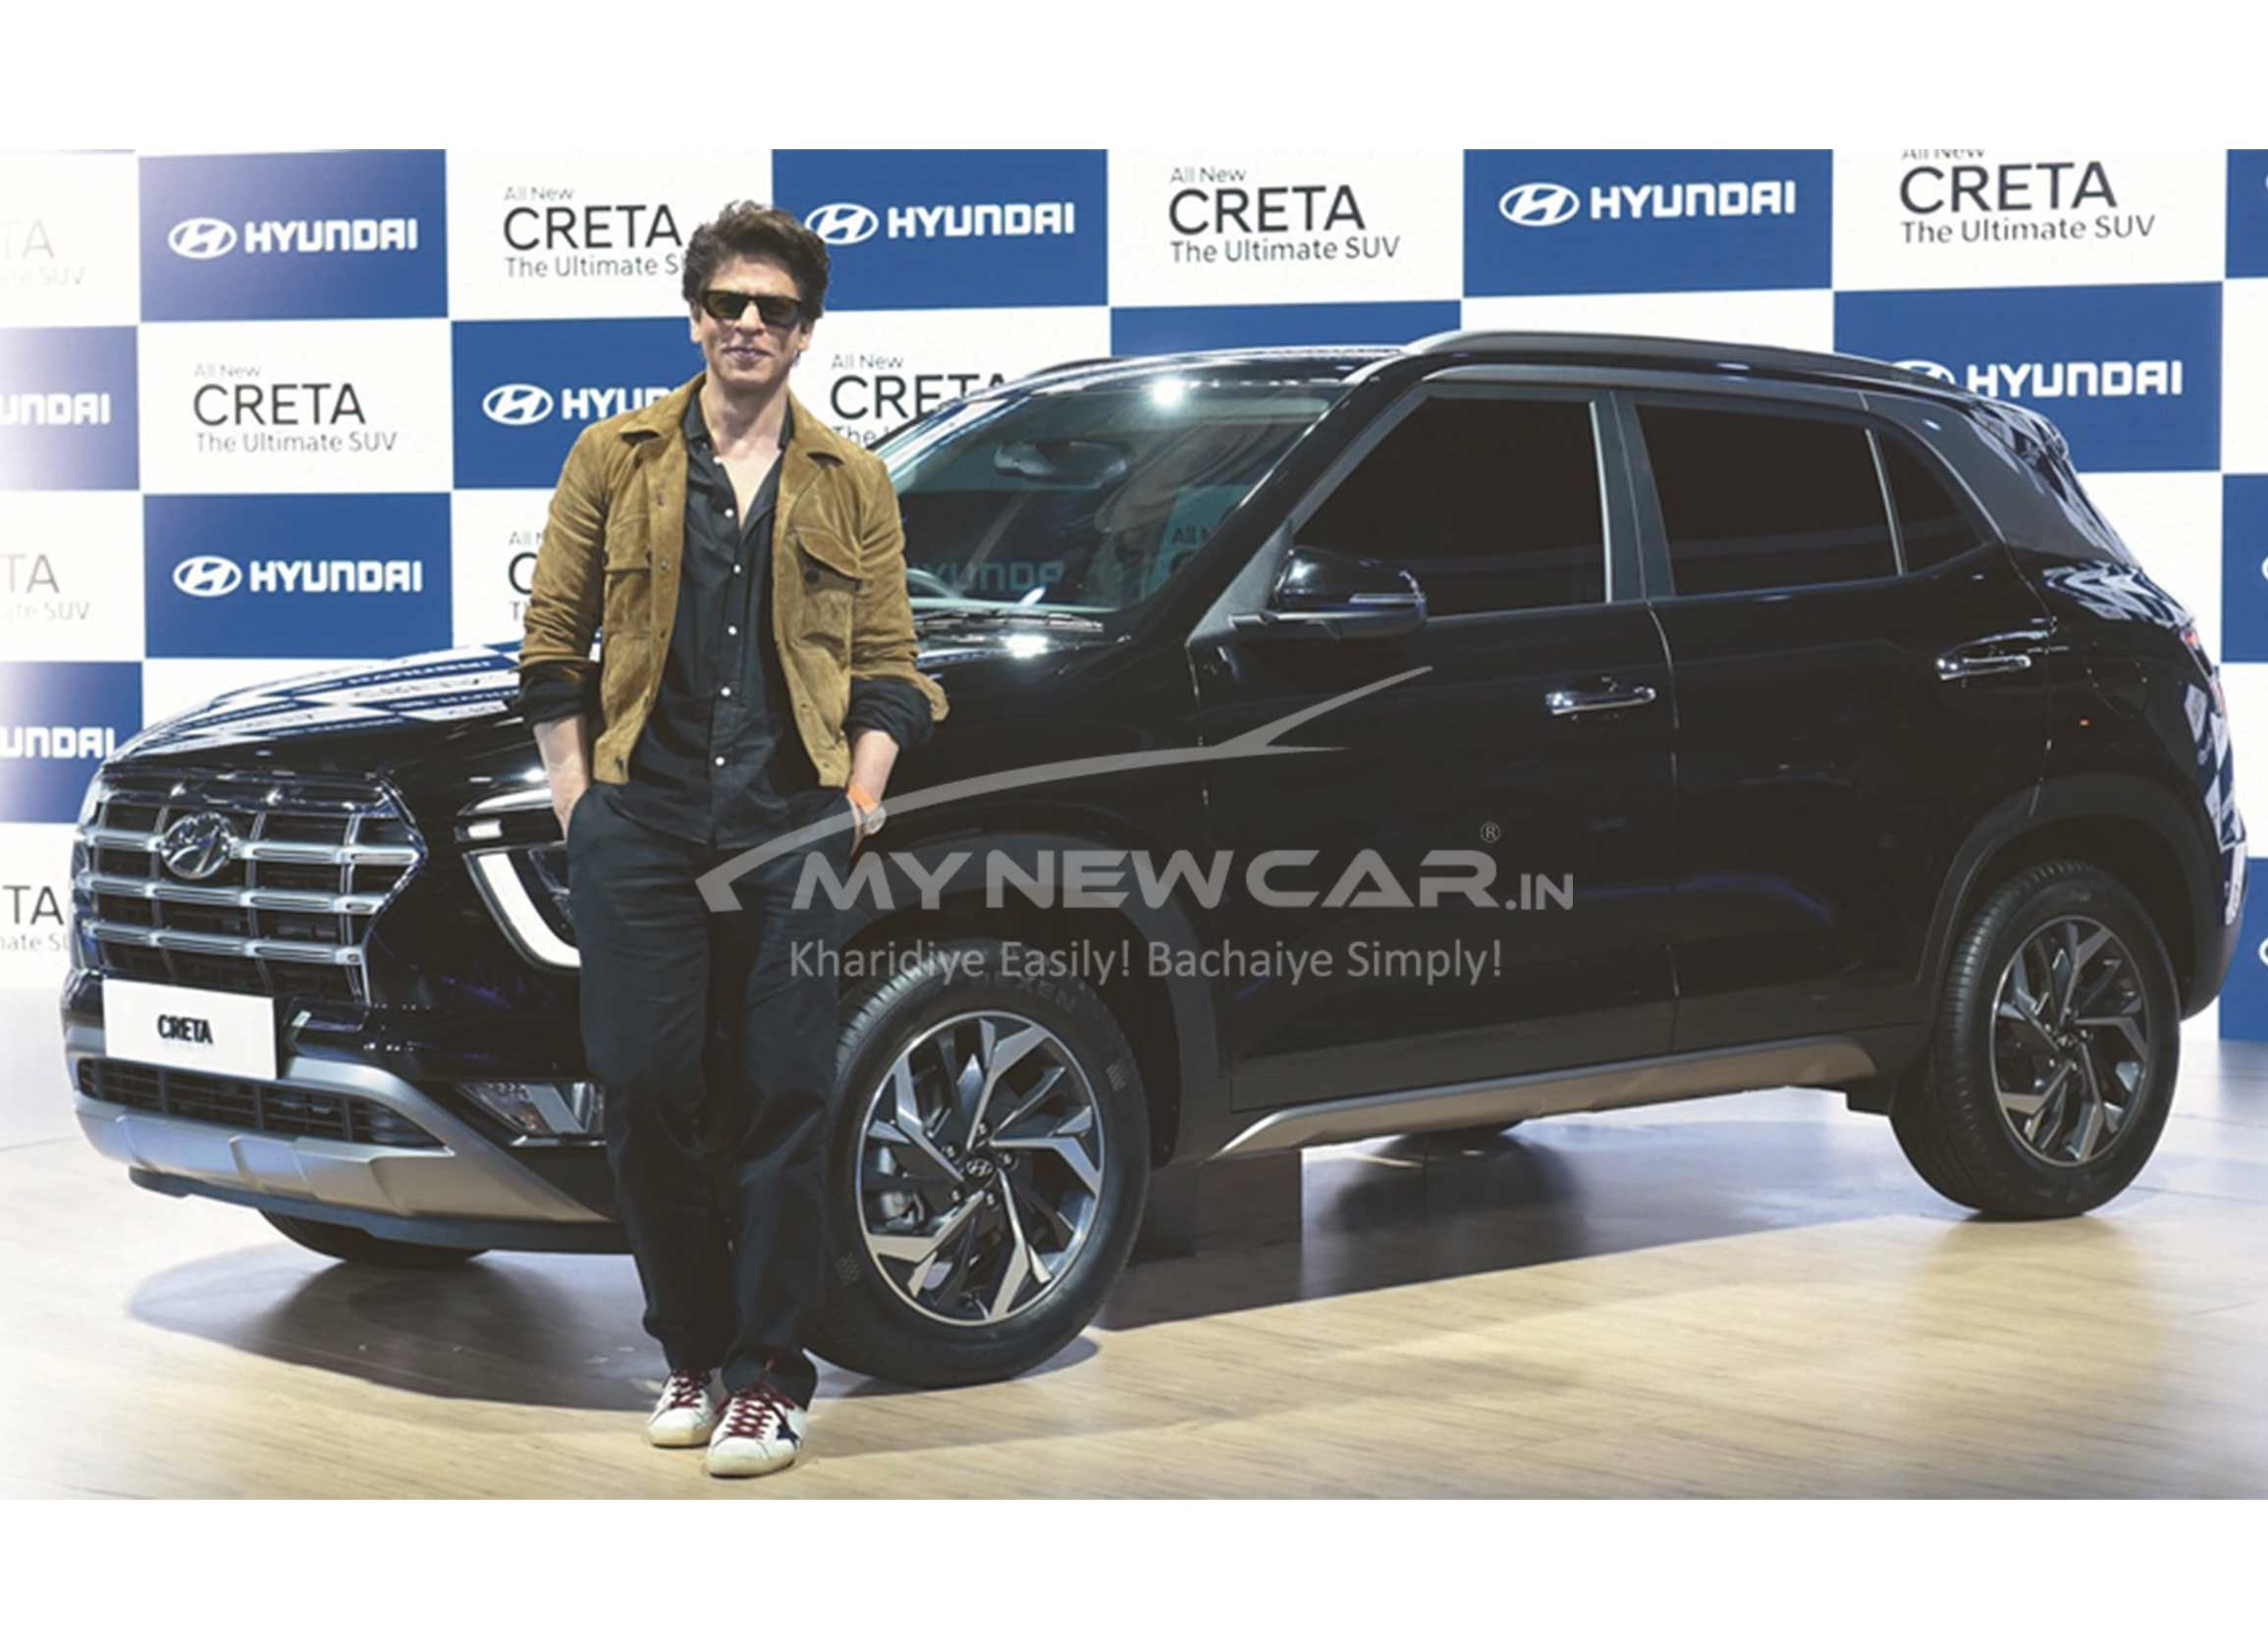 Hyundai Creta Variants Explained Price List In 2020 Hyundai Suv Petrol